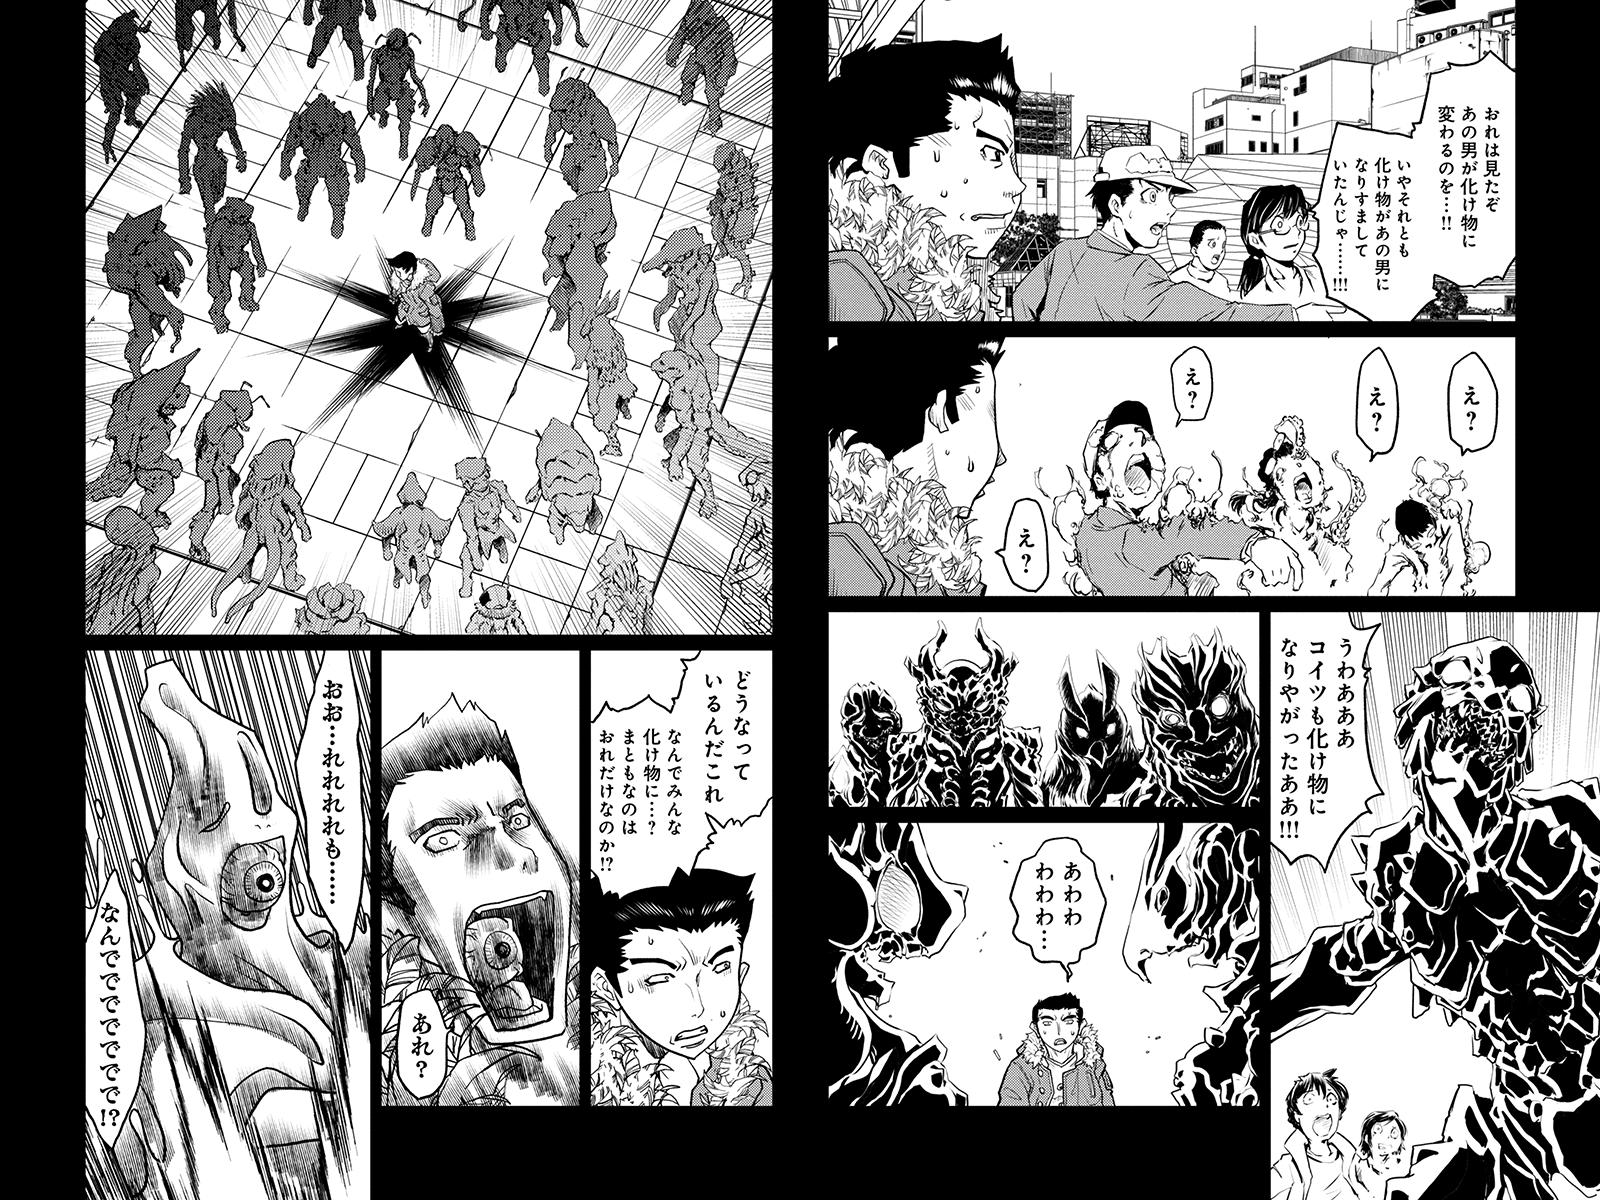 真・三湖伝説 妖 AYAKASHI